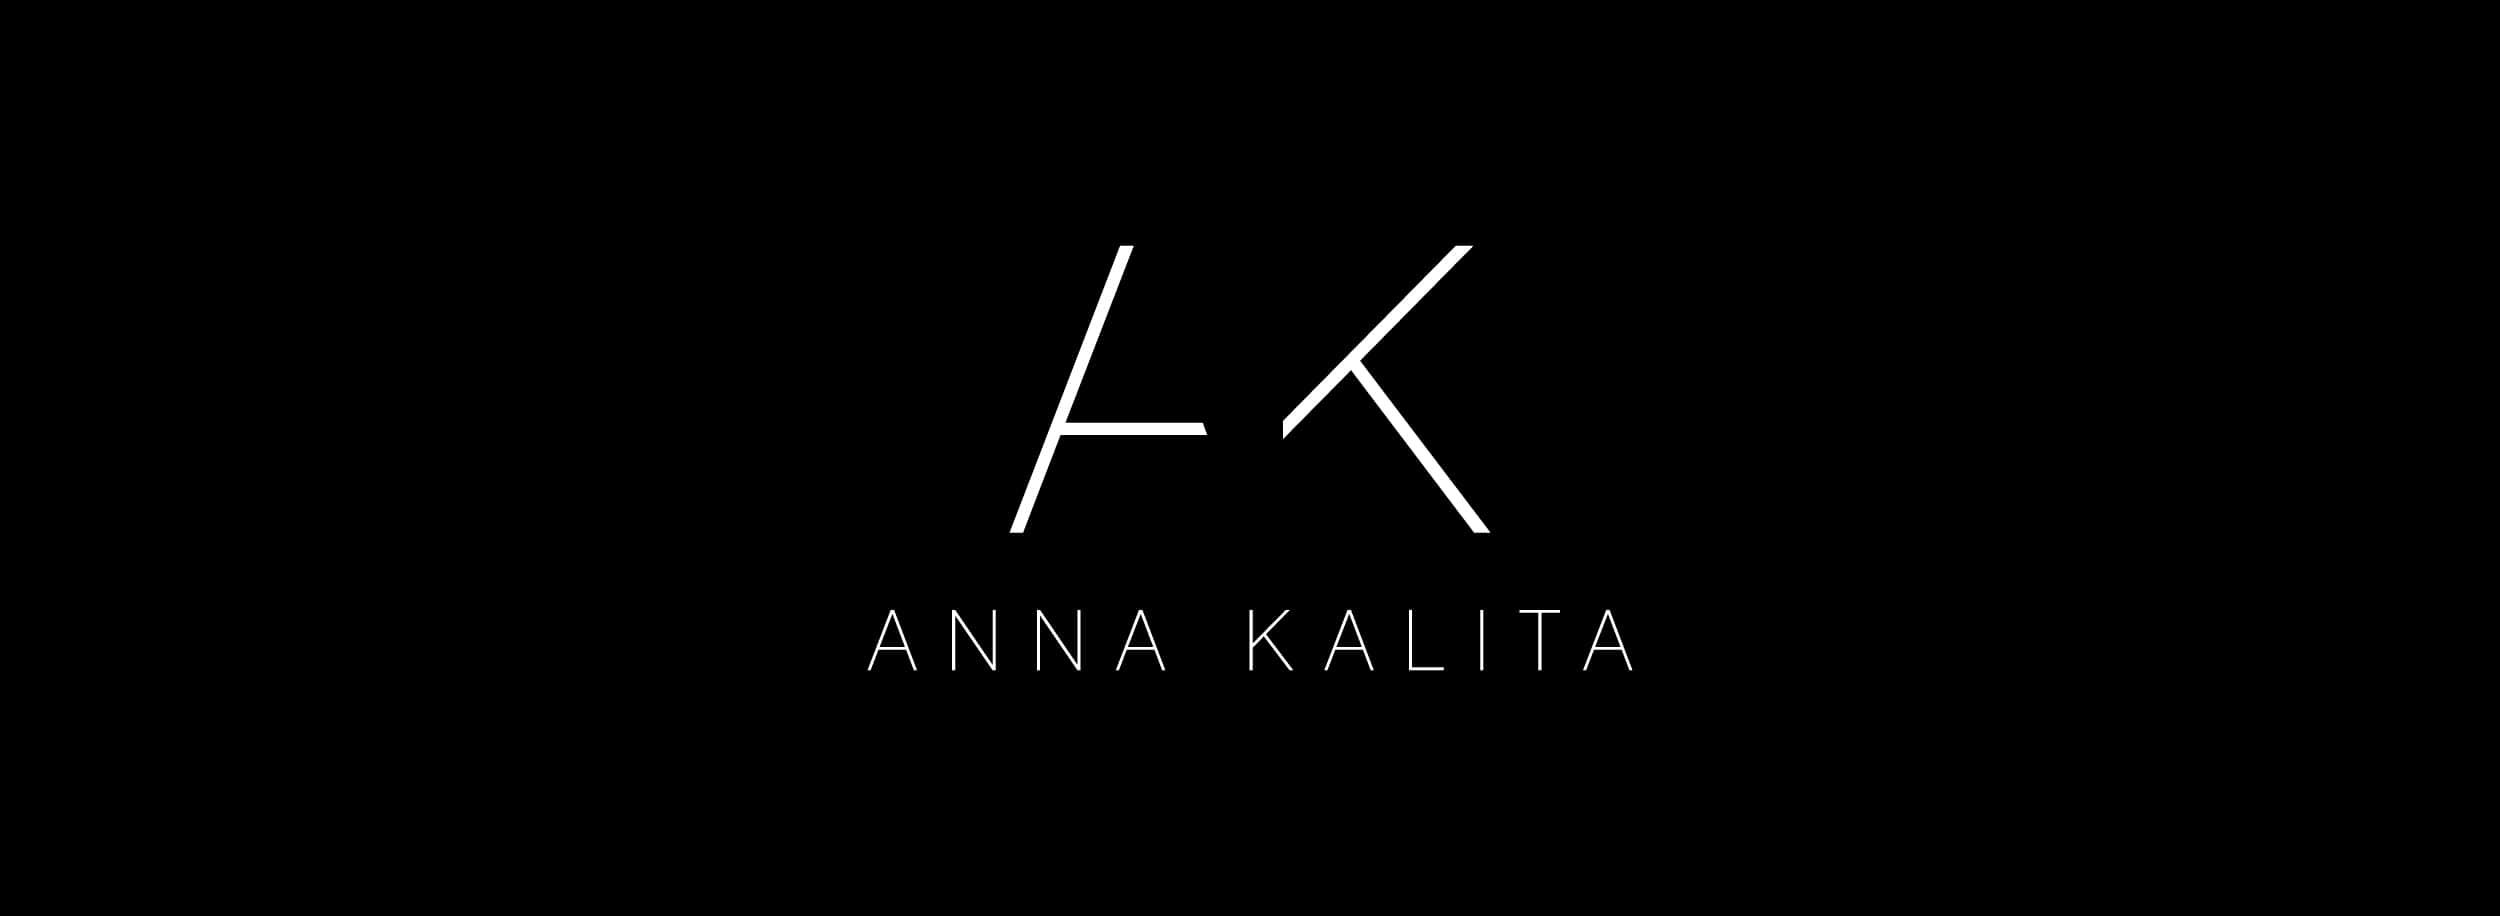 AK logo design: pure minimalist typography. © LET'S PANDA